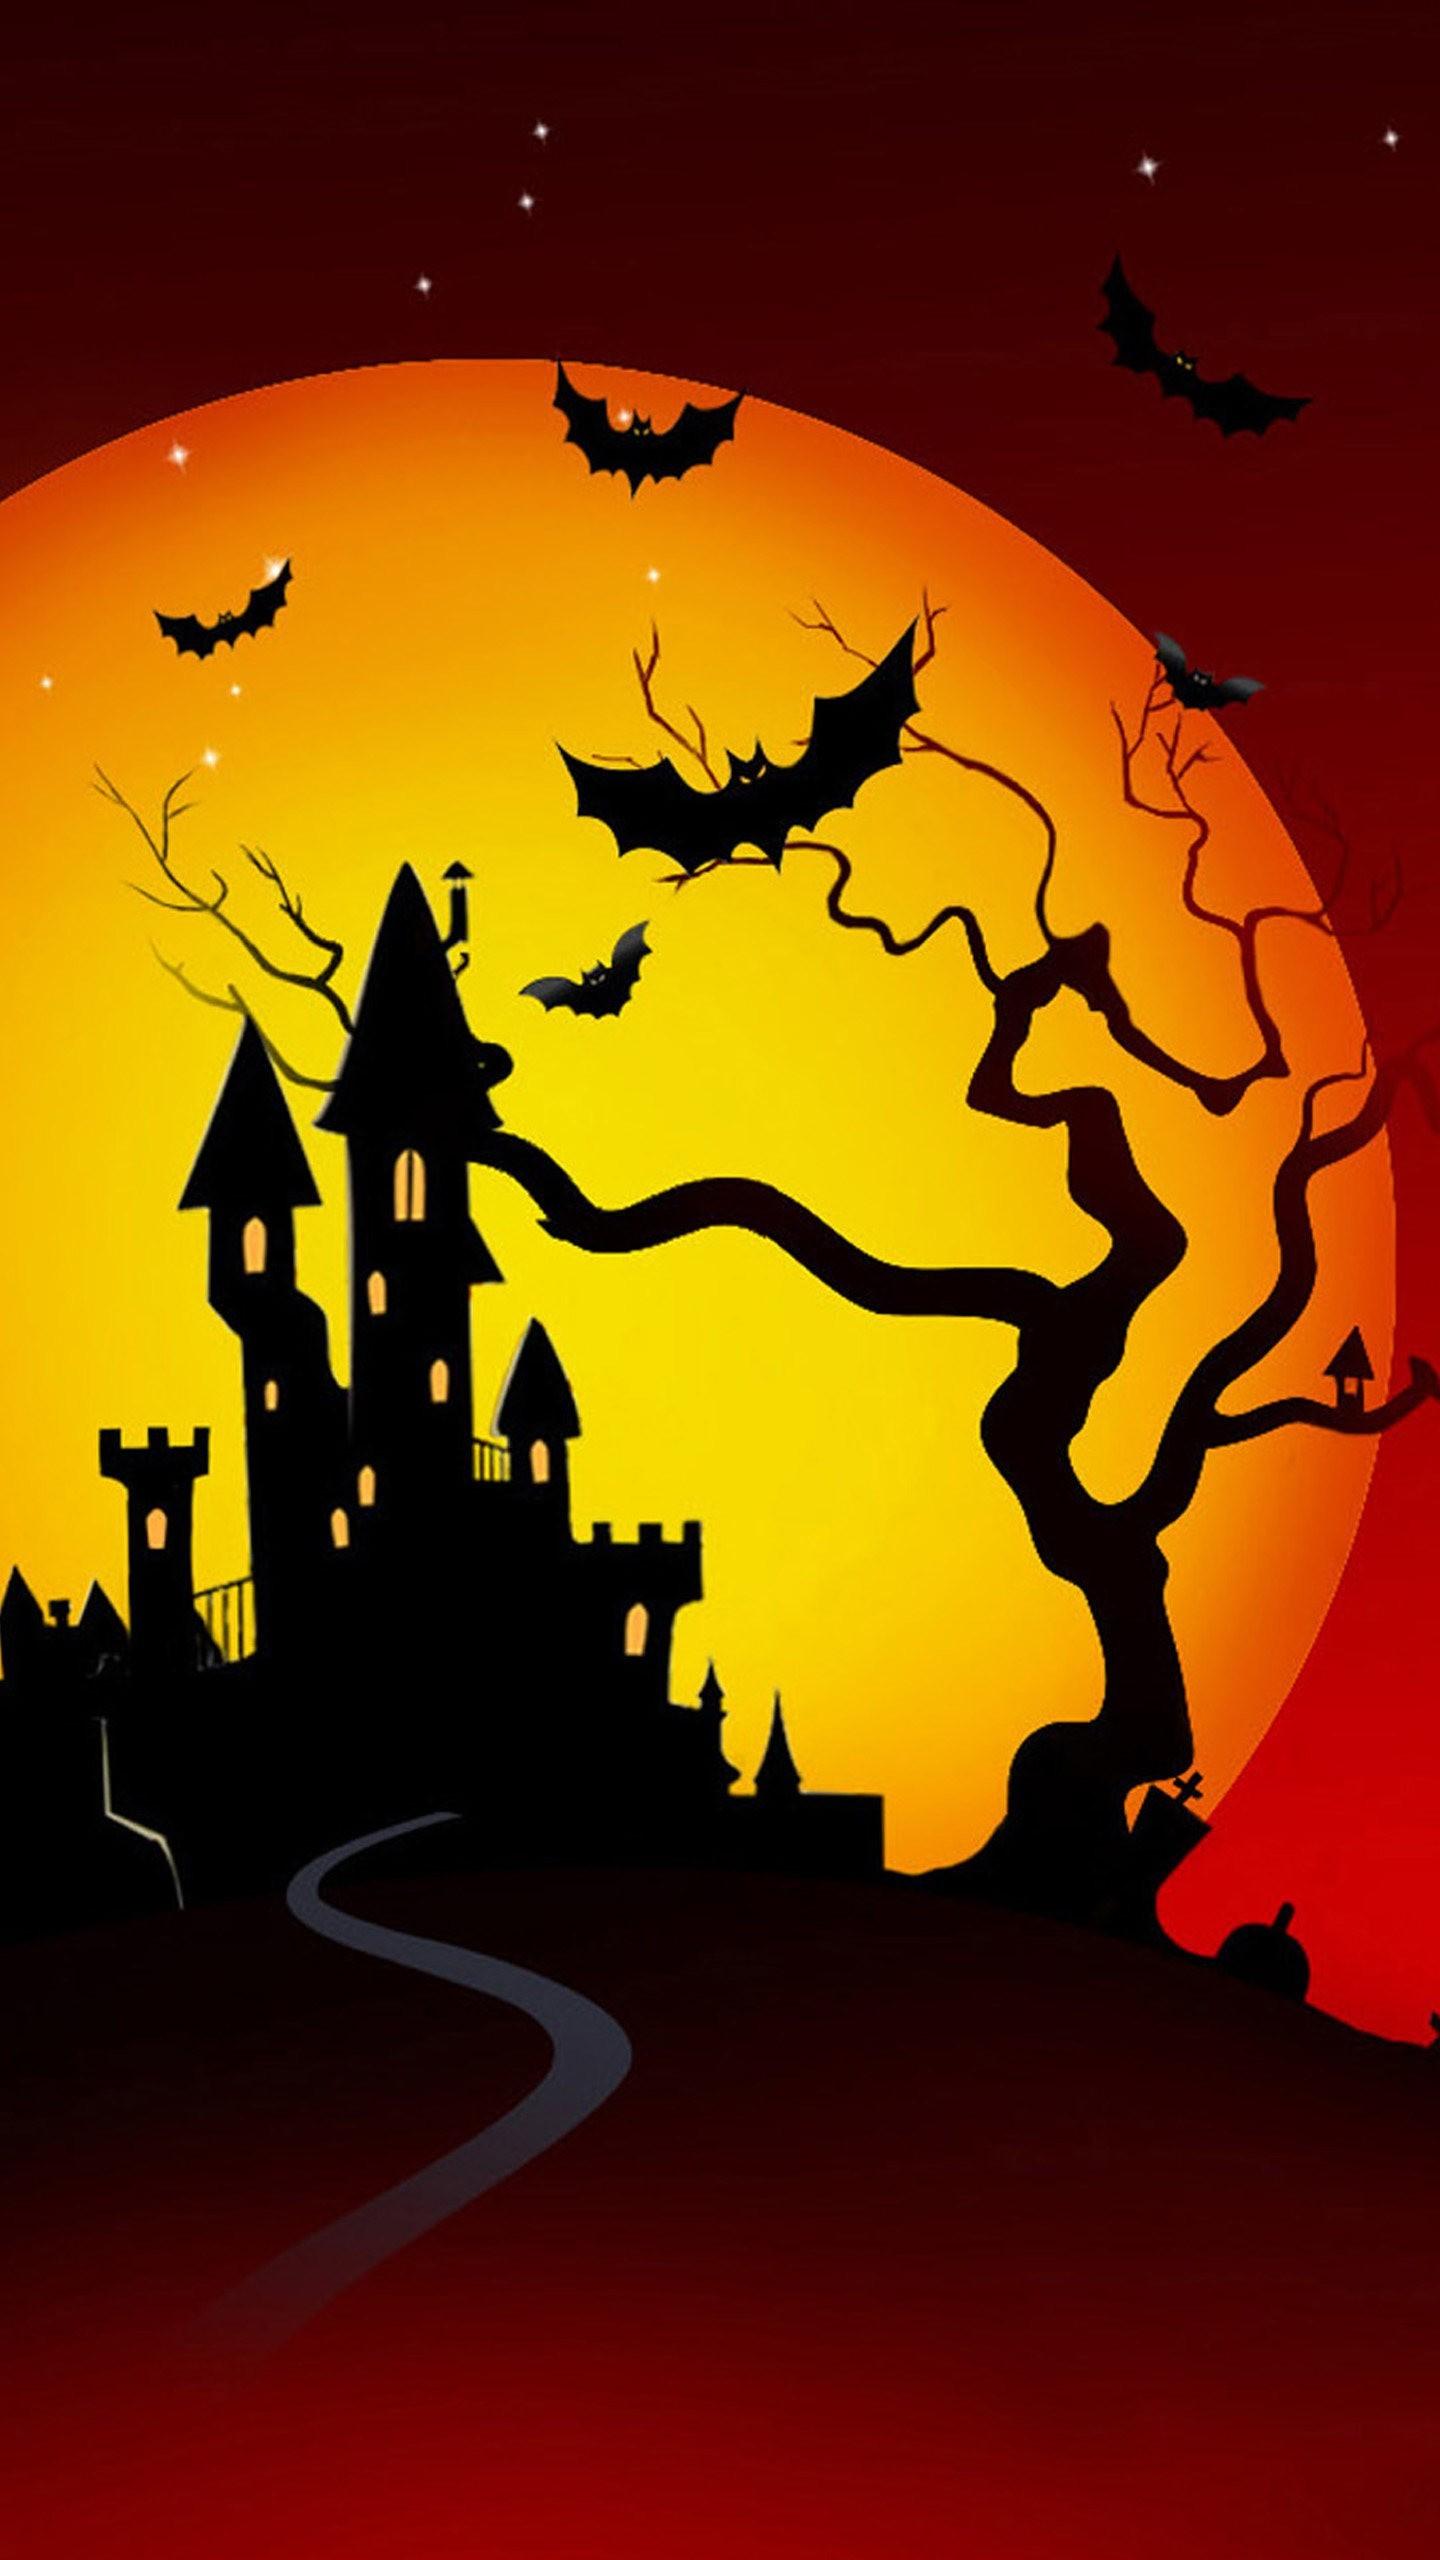 Cool Wallpaper Halloween Galaxy S6 - halloween-bats-and-castle-wallpaper-background-1440x2560  Picture_1003150.jpg